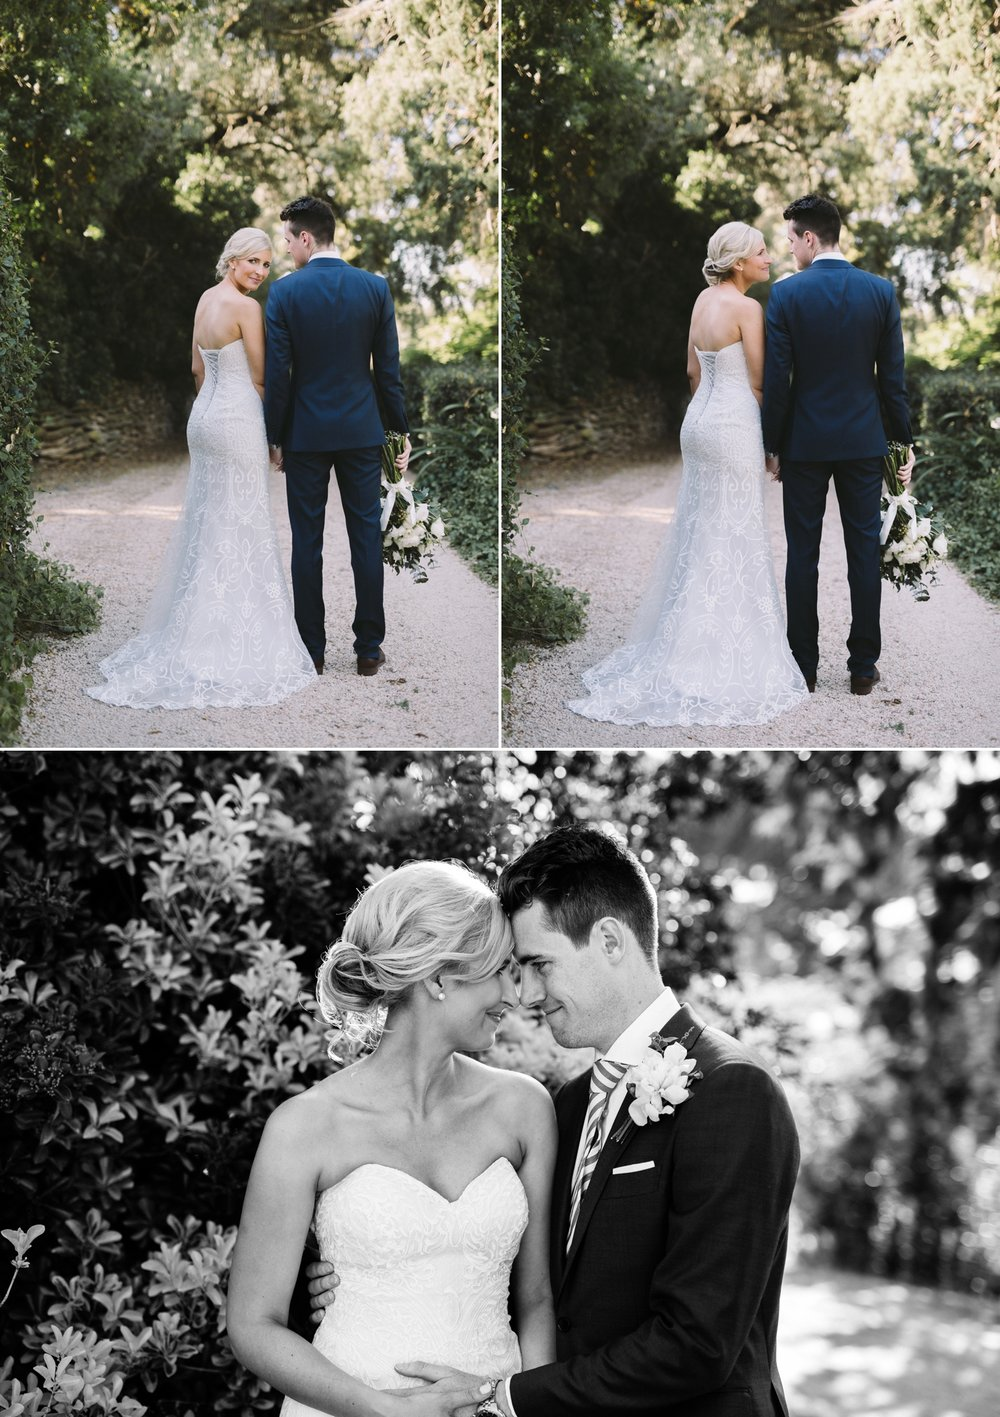 Lauren & Max - Marybank Estate Wedding - Natural wedding photographer in Adelaide - www.katherineschultzphotography.com 73